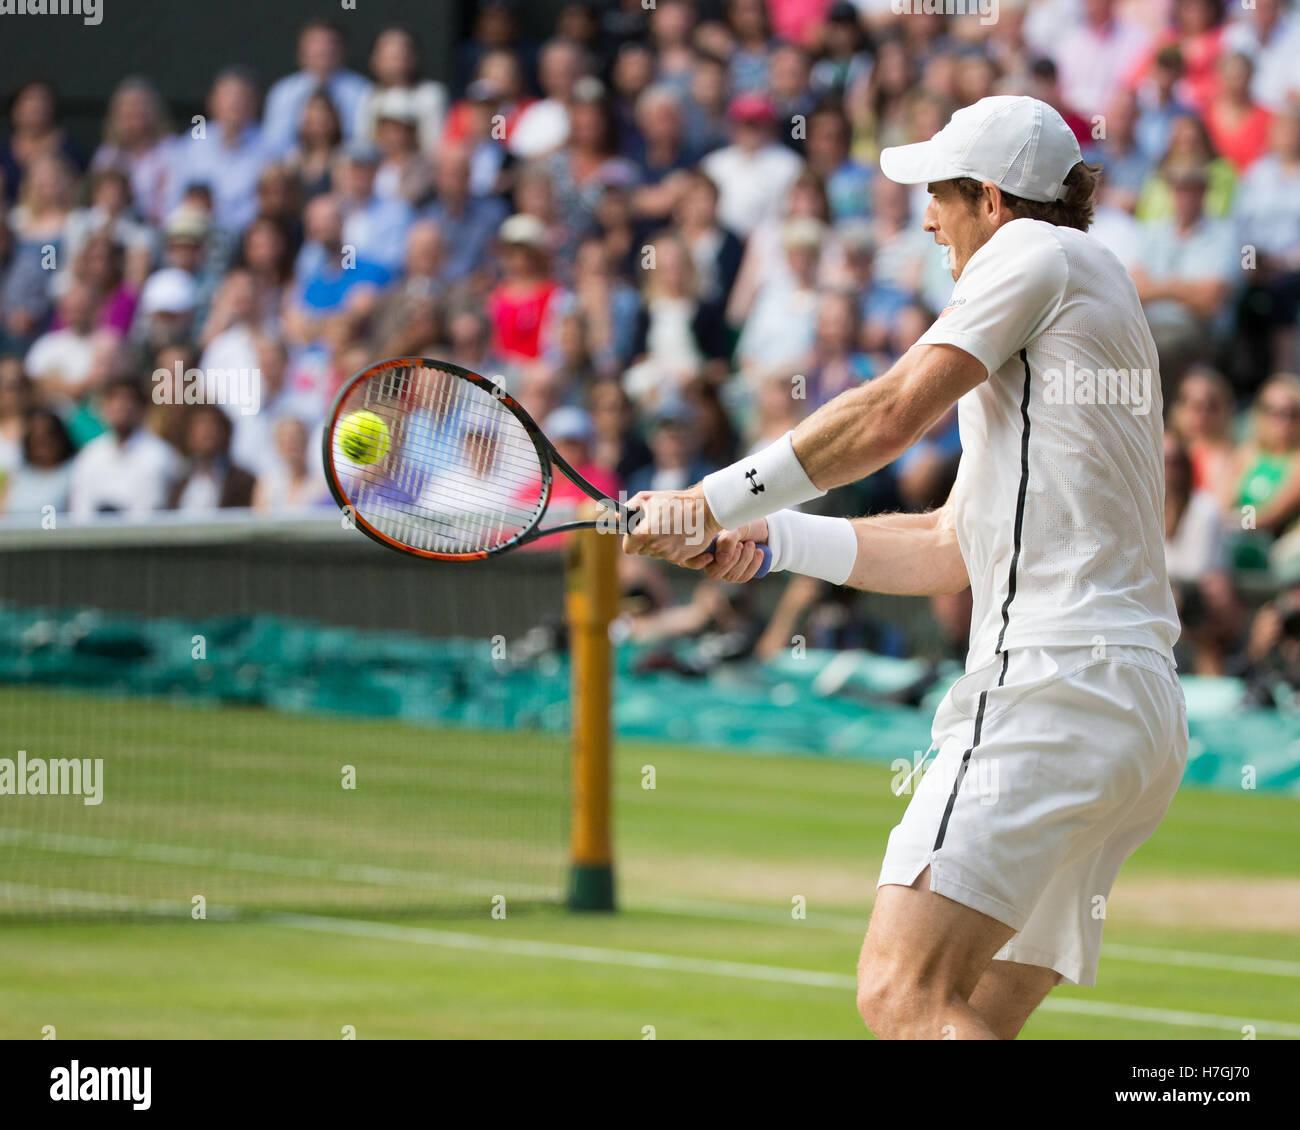 Andy Murray (GBR),Wimbledon Championships 2015, London,England Stock Photo